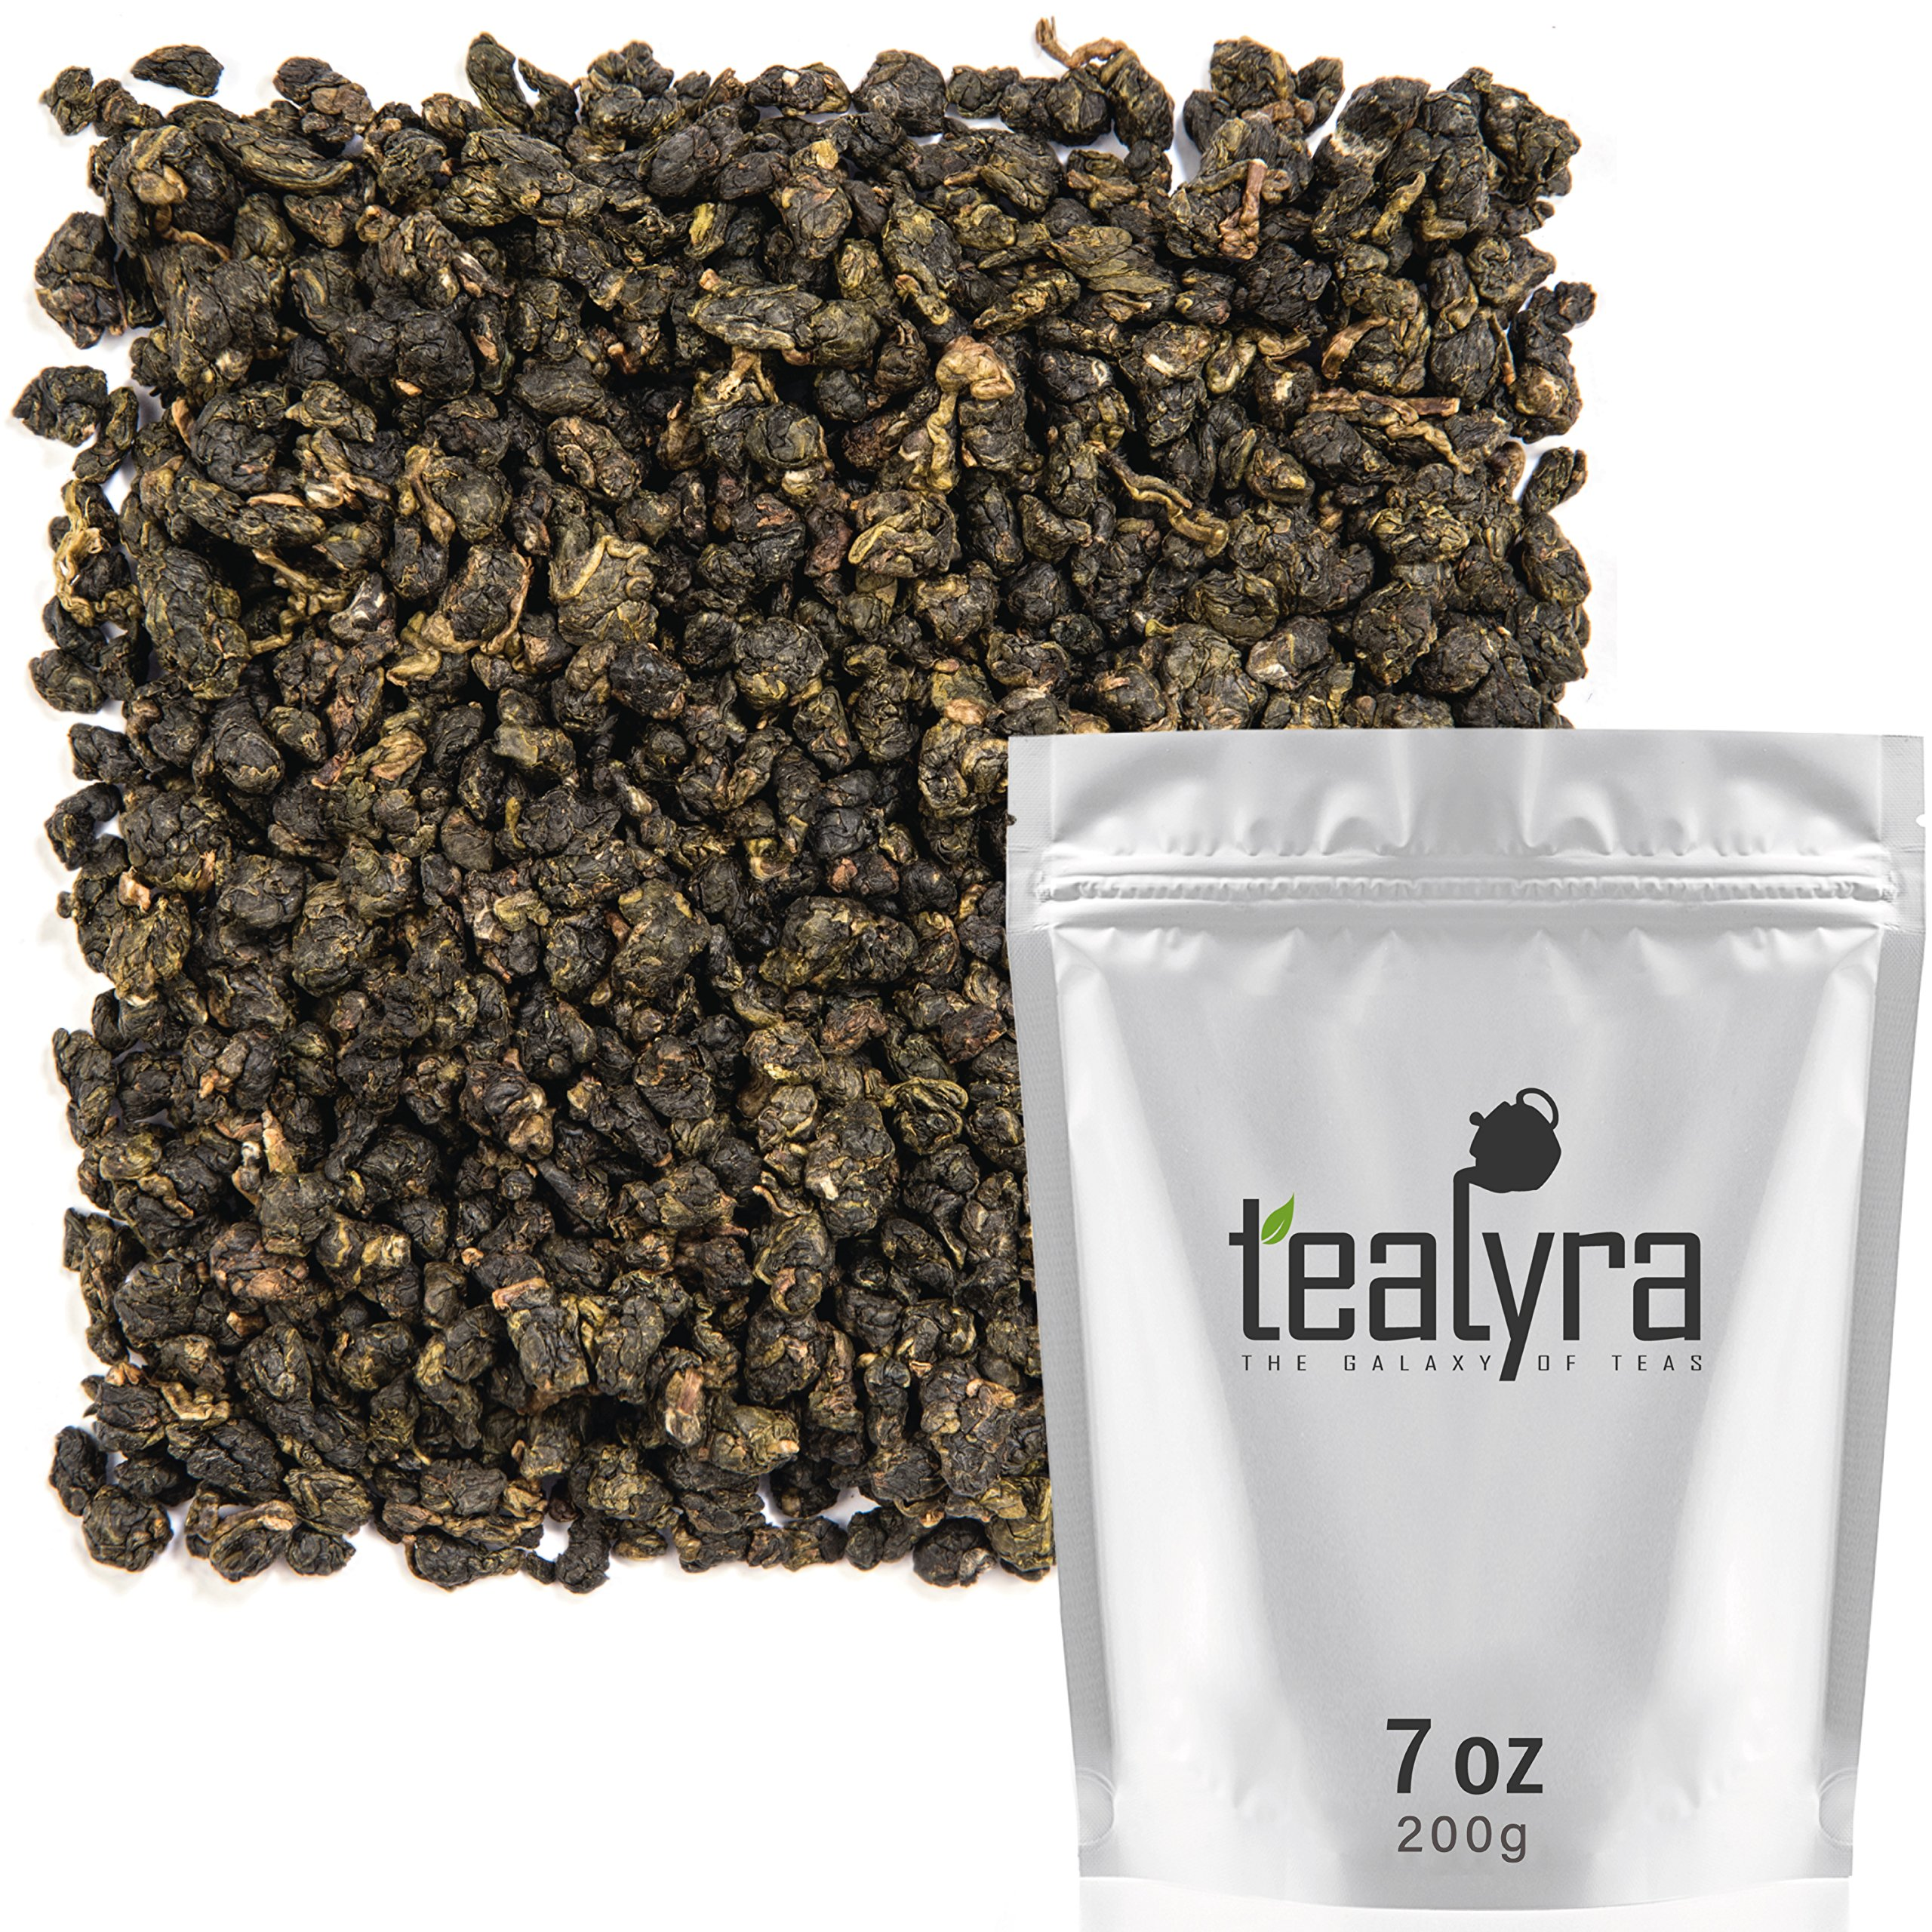 Tealyra - Milk Jin Xuan Oolong - High Mountain Taiwanese Loose Leaf Tea - Great Milky Cream Taste and Aroma - Organically Grown - Weight Loss Tea - 200g (7-ounce) by Tealyra